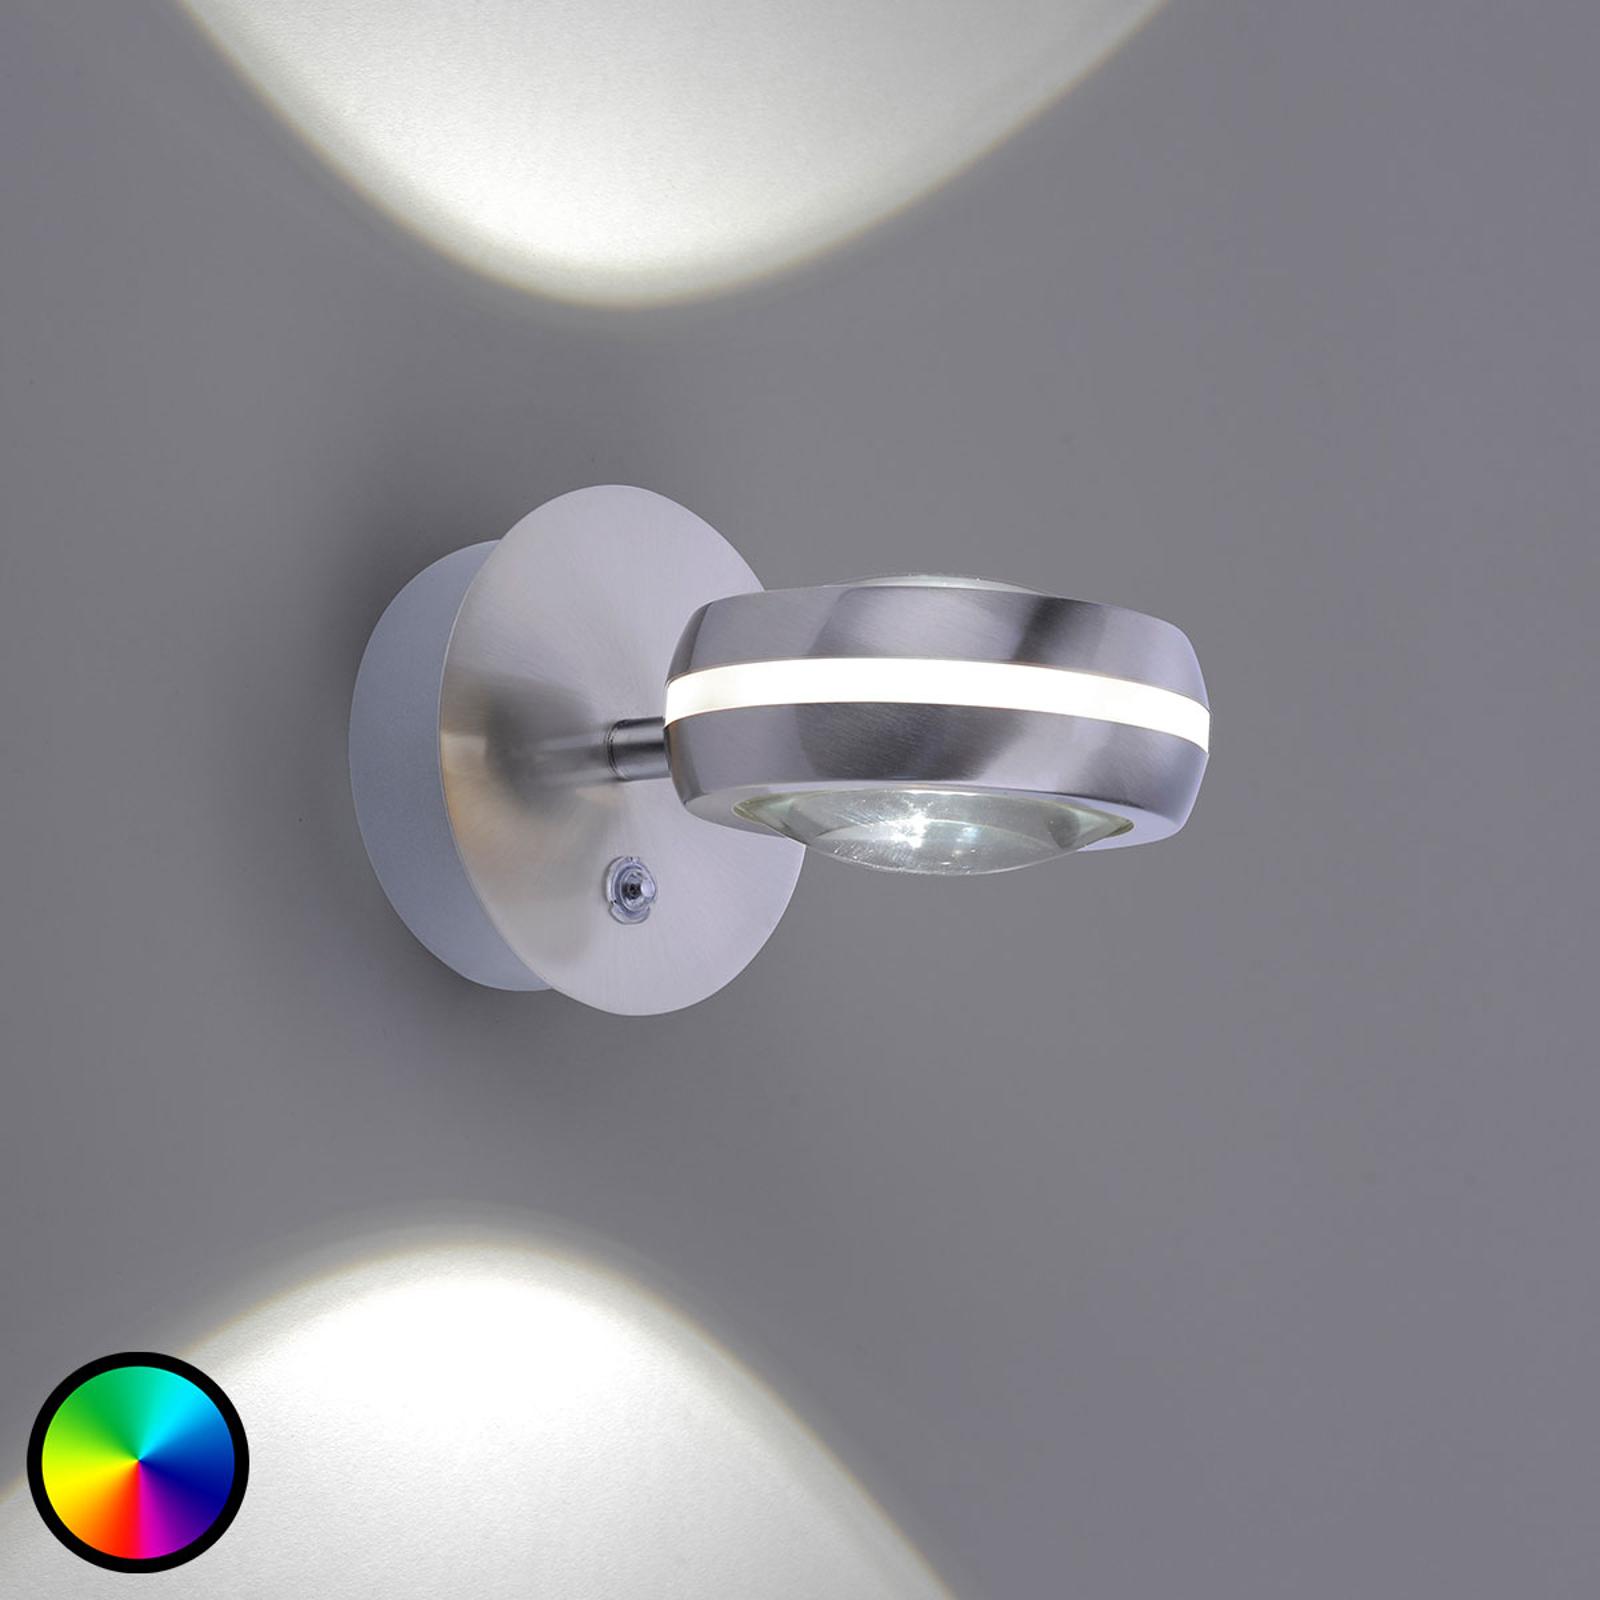 Trio WiZ Vista LED-vägglampa up and down